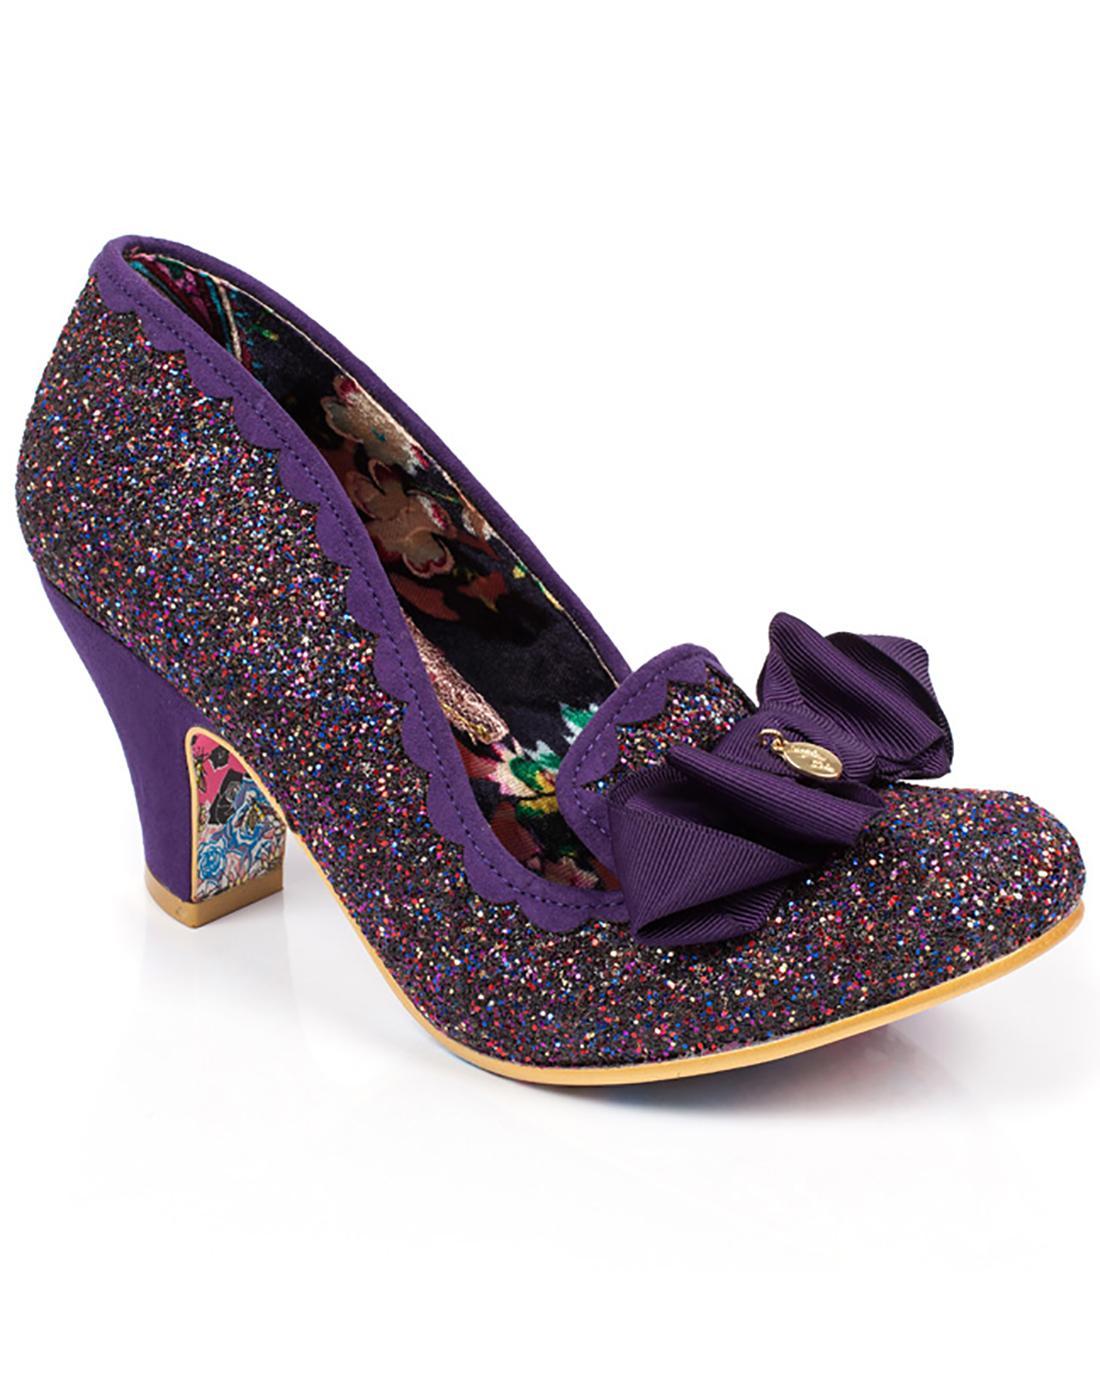 Kanjanka IRREGULAR CHOICE Glitter Party Shoes